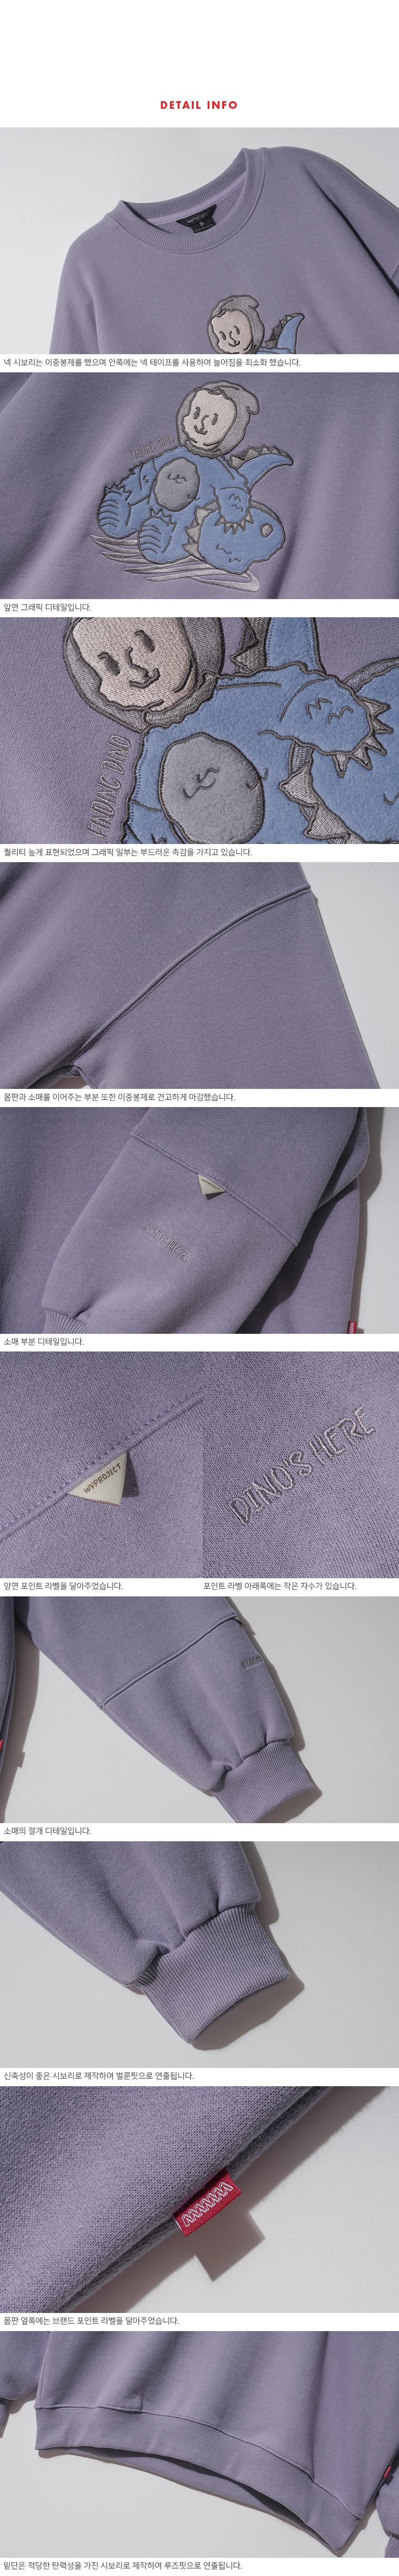 JIMT7538_detail_lavender_ji.jpg